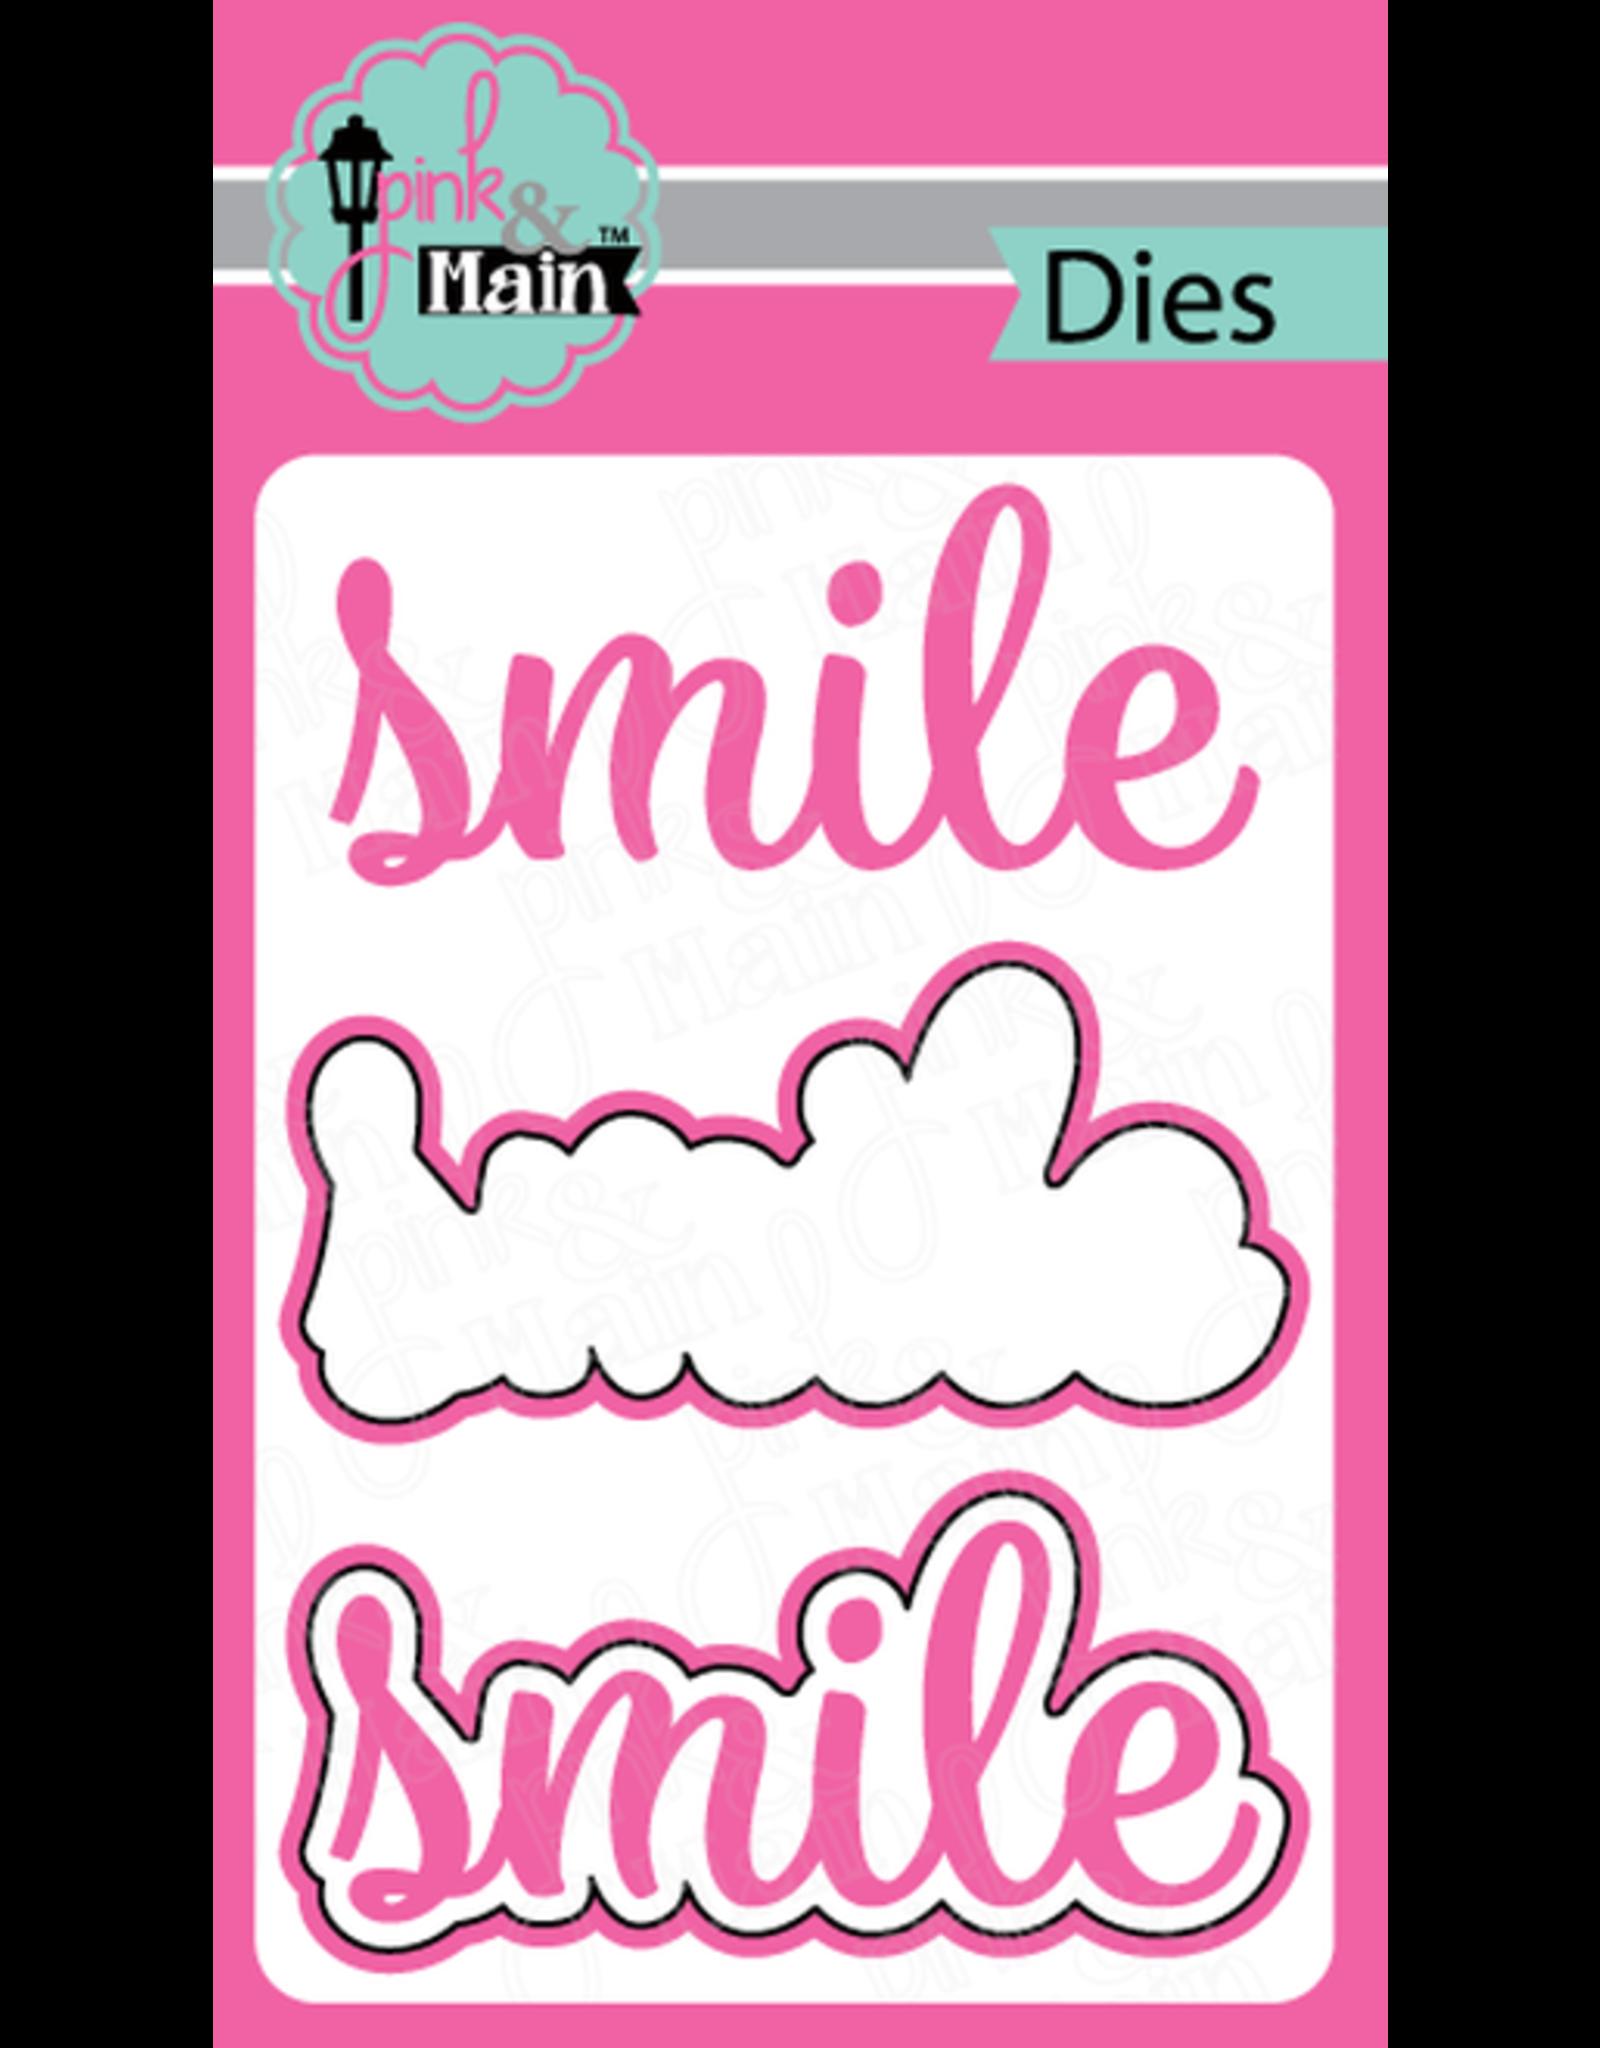 Pink and Main Smile Dies